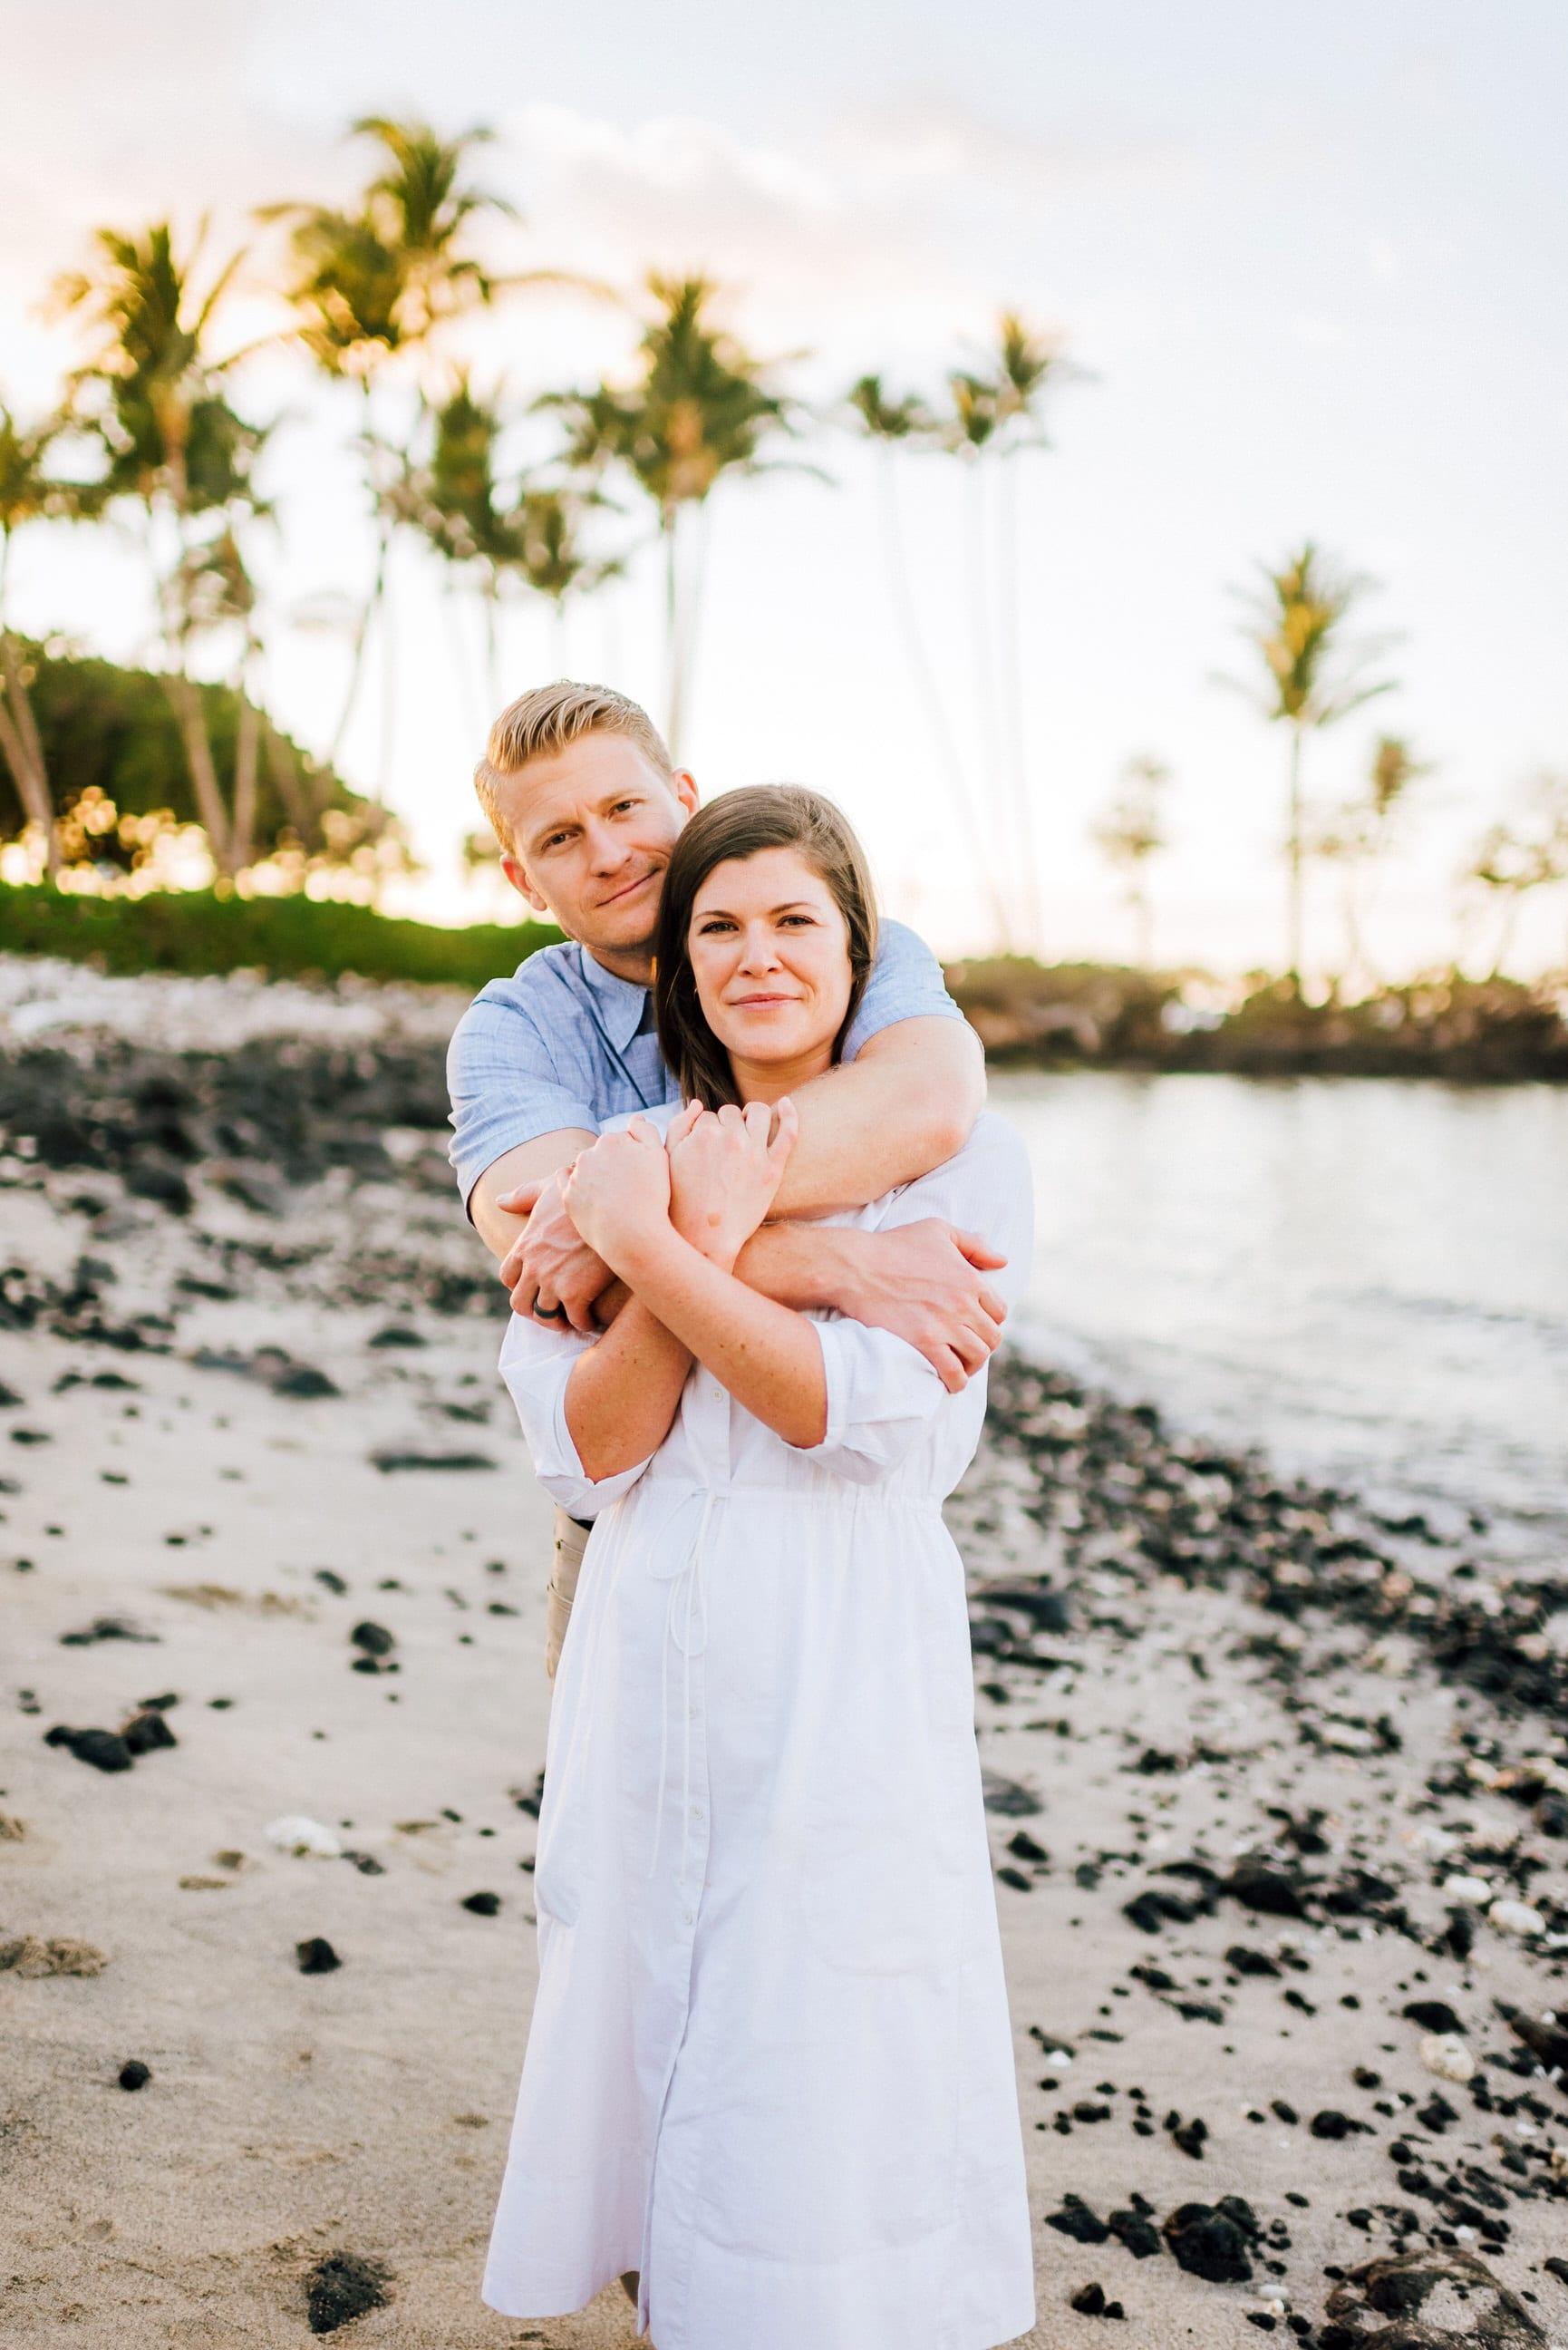 Hawaii-Family-Photographer-Waikoloa-Fairmont-Hualalai-Mauna-Kea-27.jpg